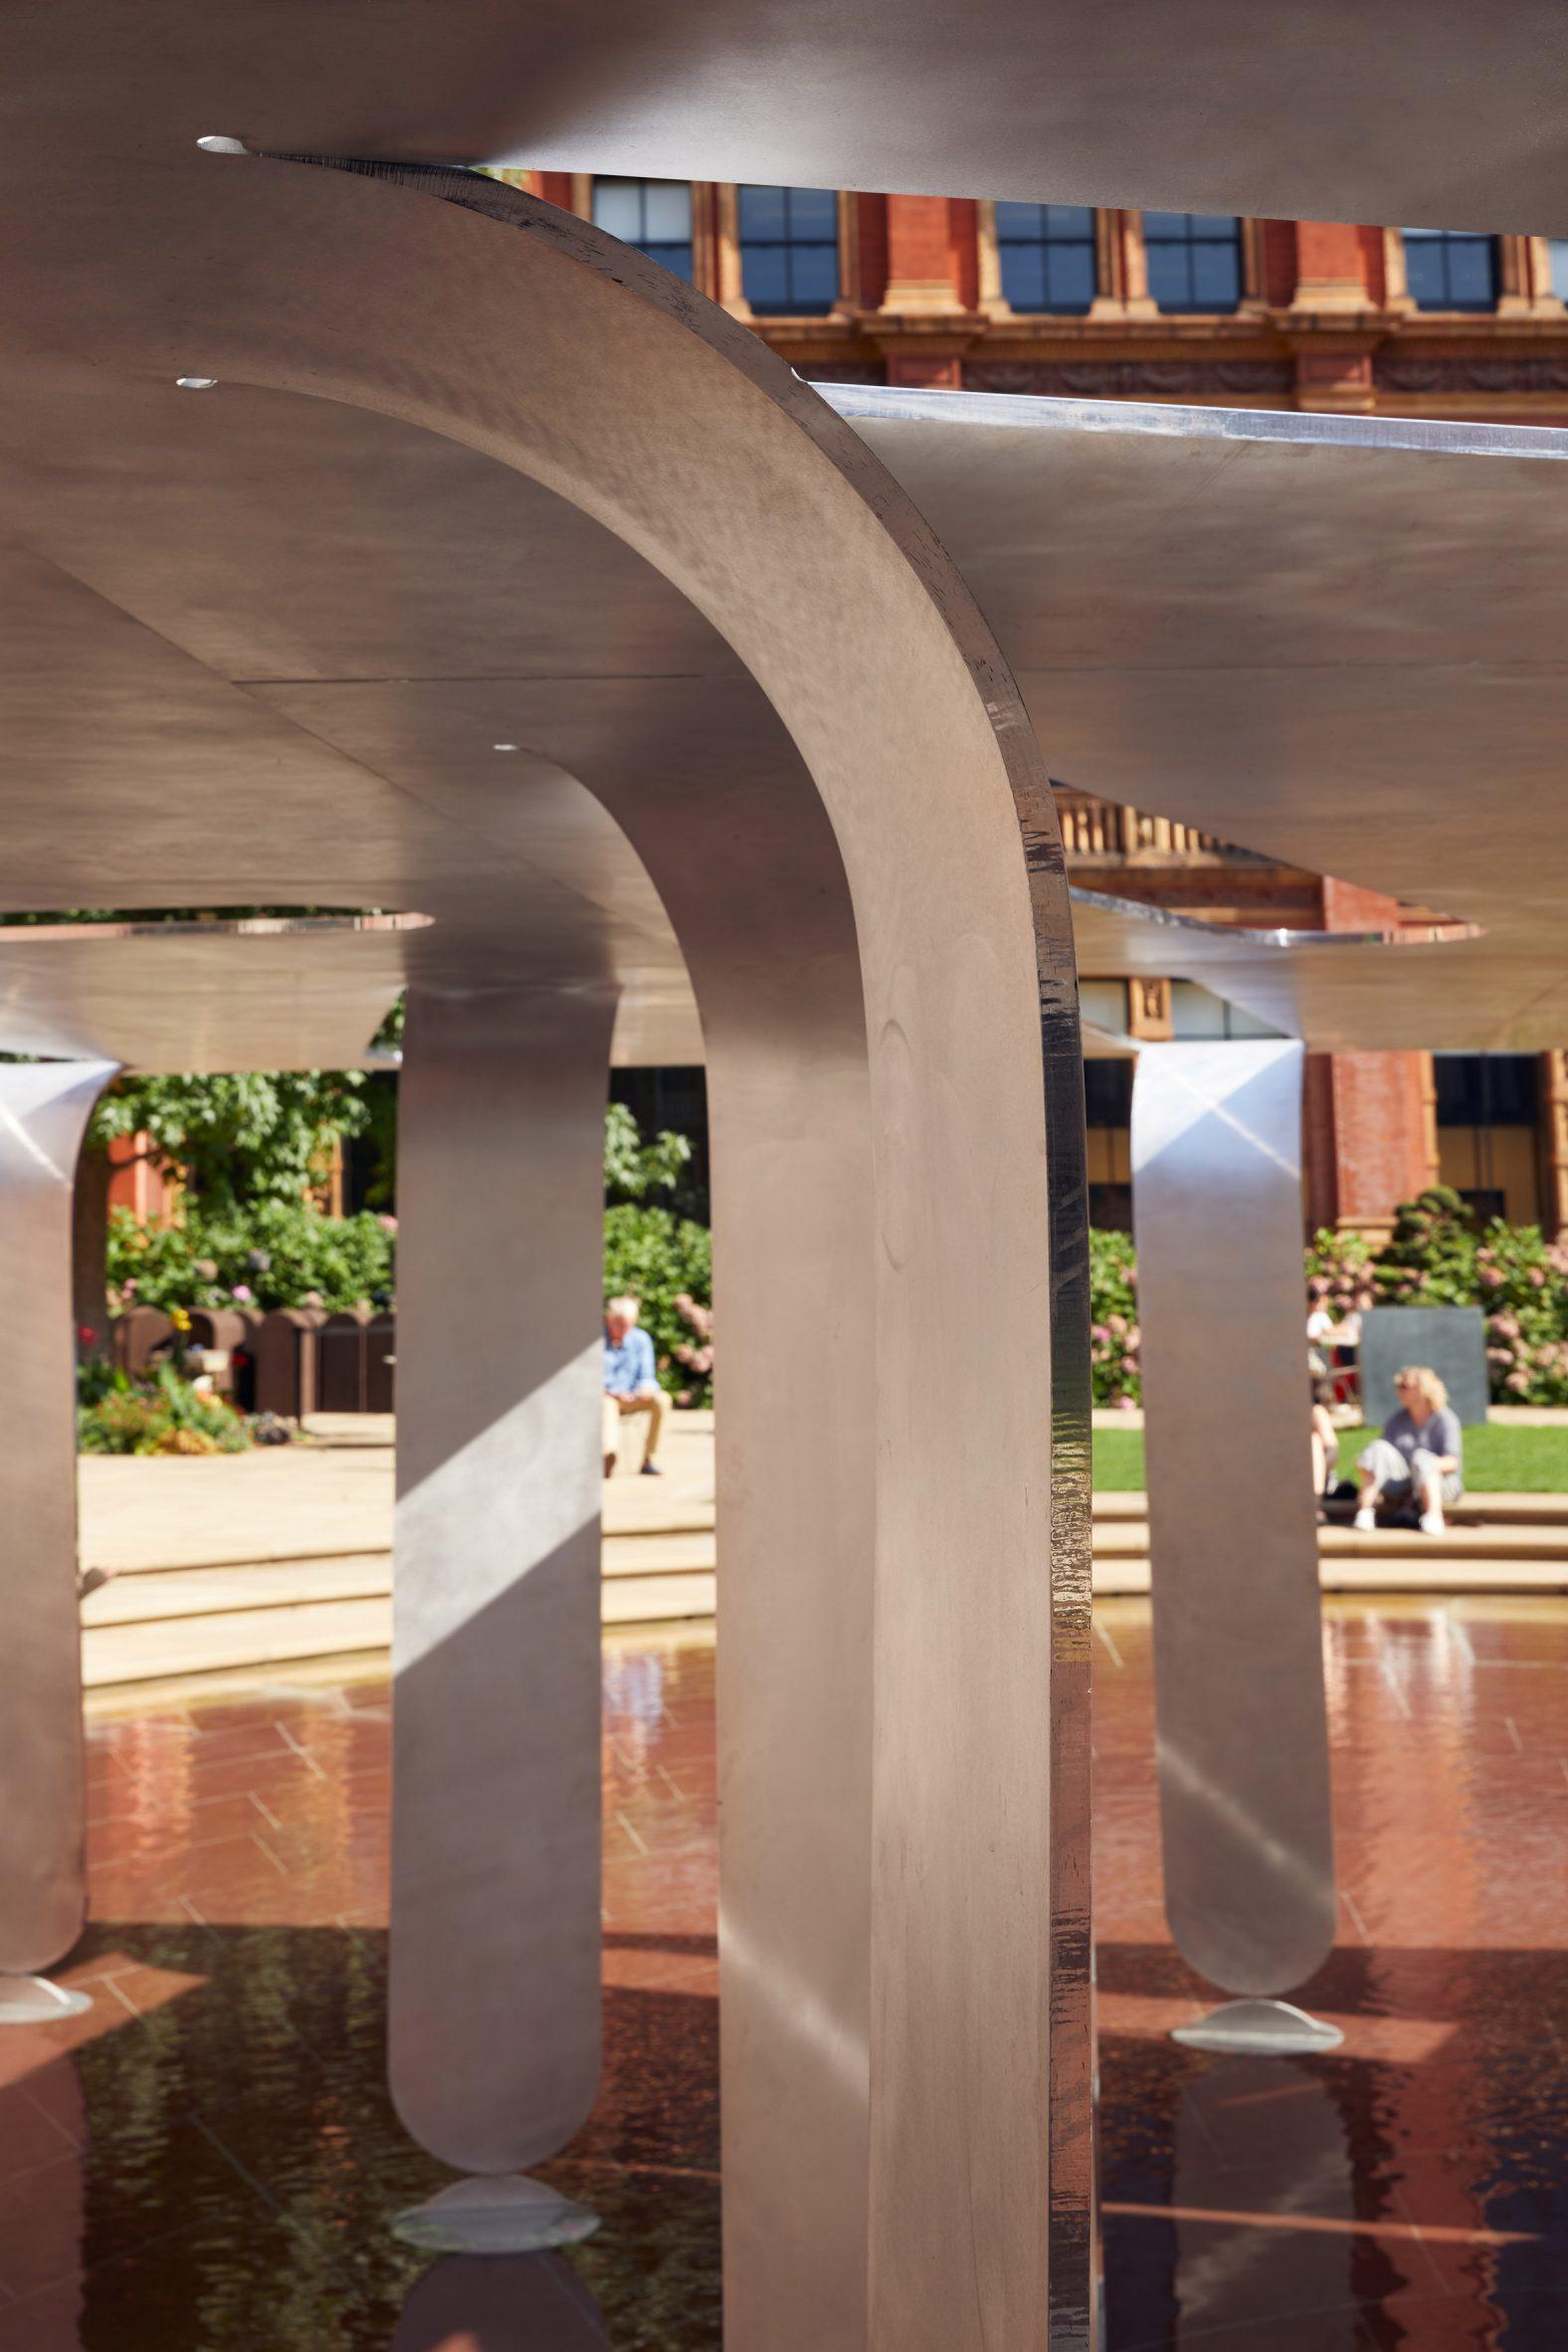 Bent aluminium in Nebbia Works pavilion for LDF